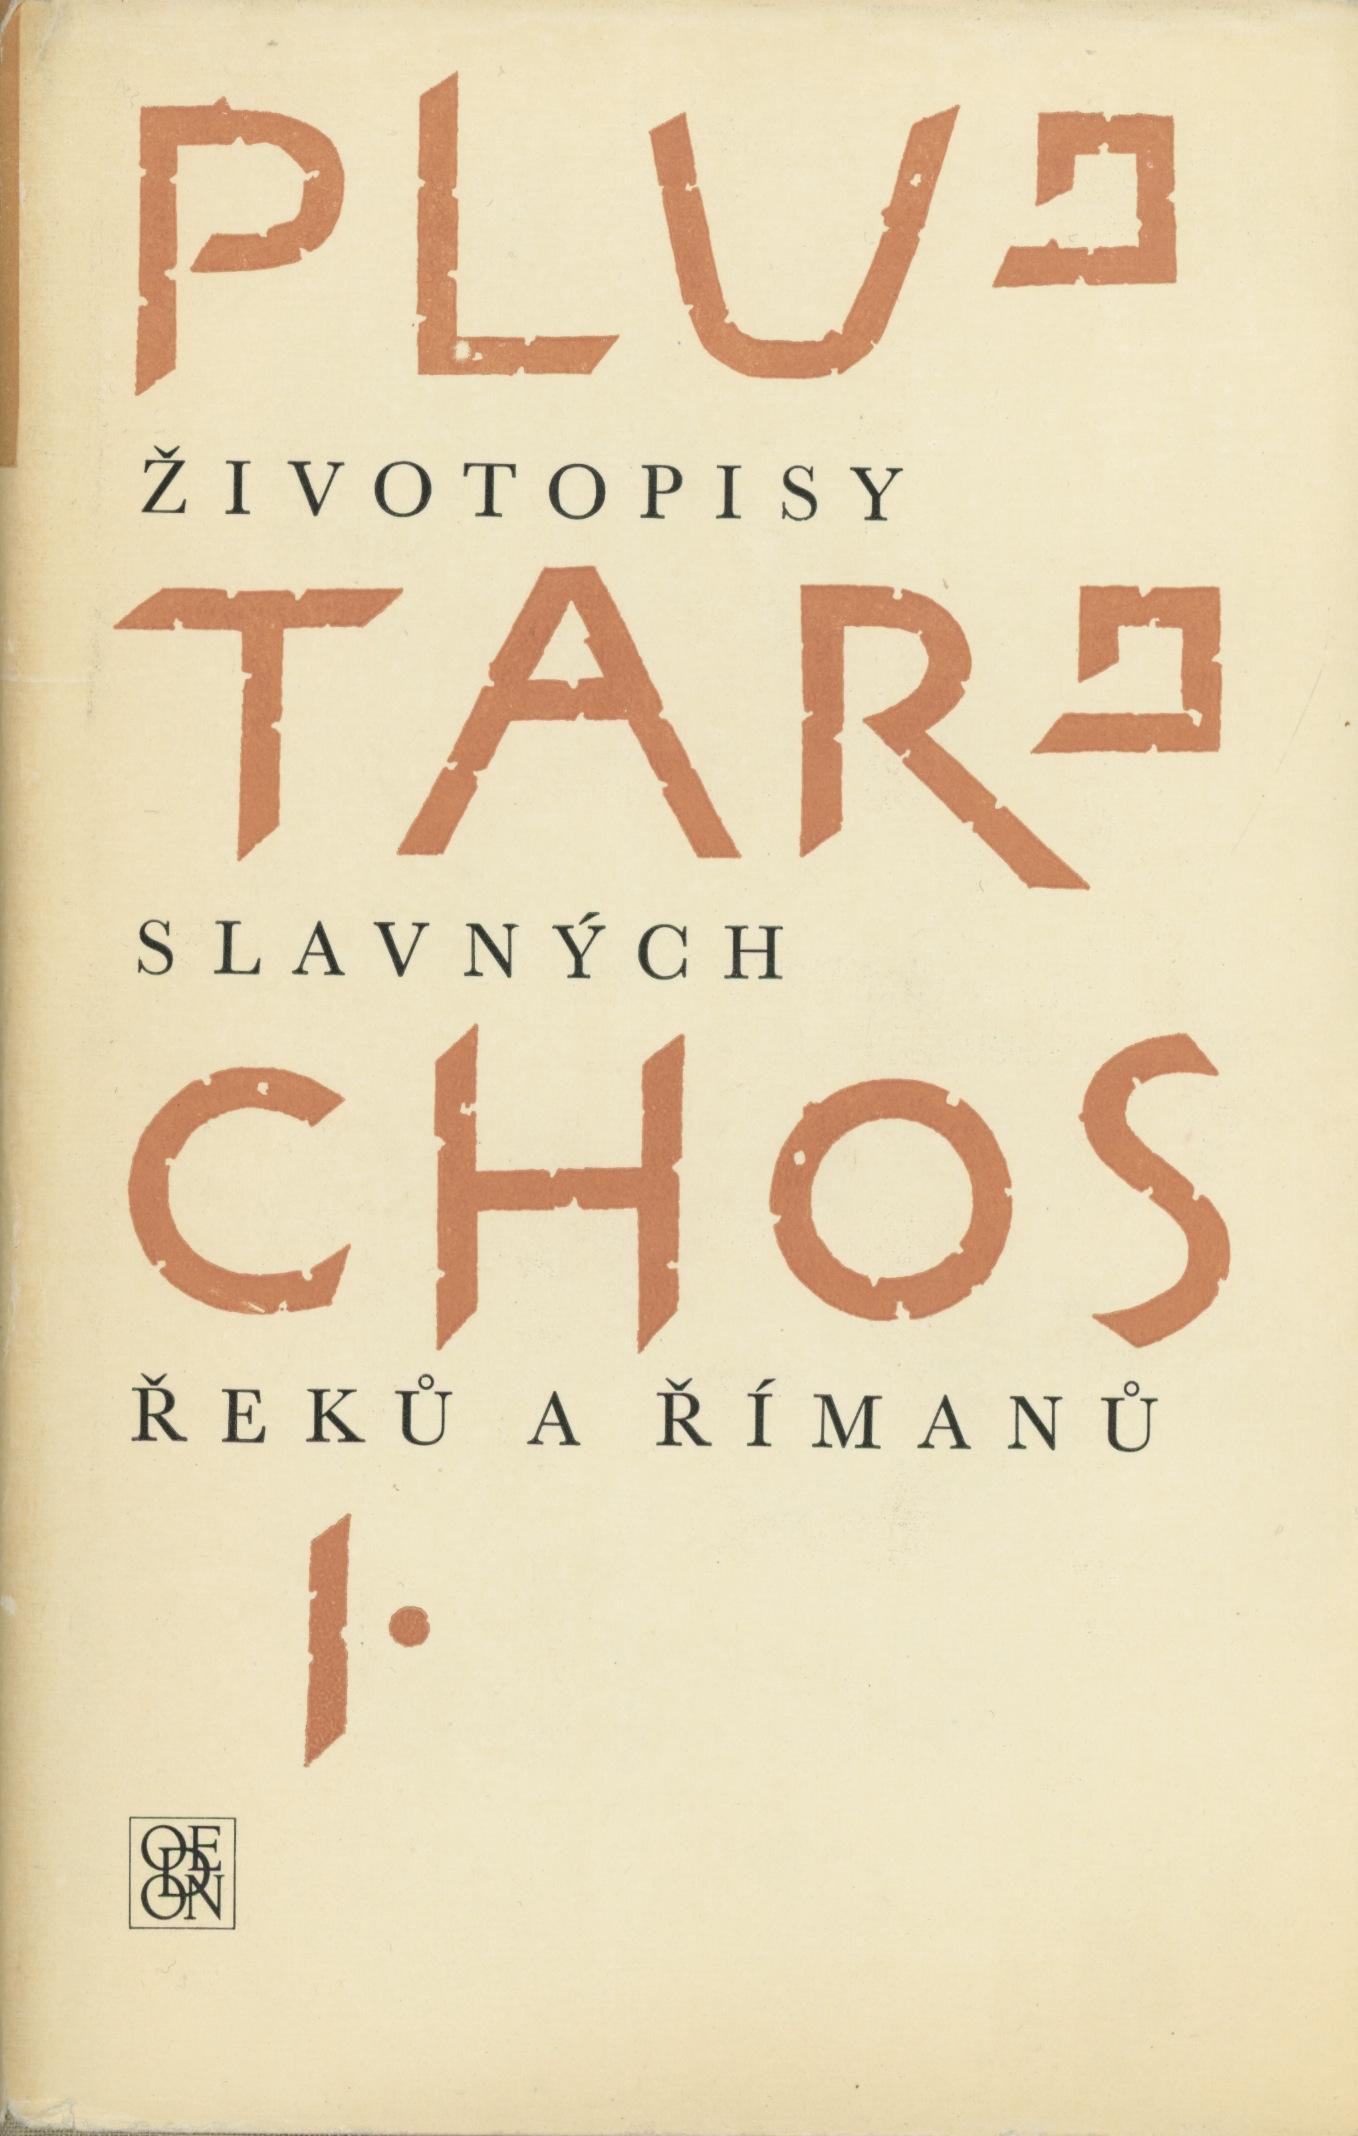 Plutarchos Zivotopisy Slavnych Reku A Rimanu I Ii